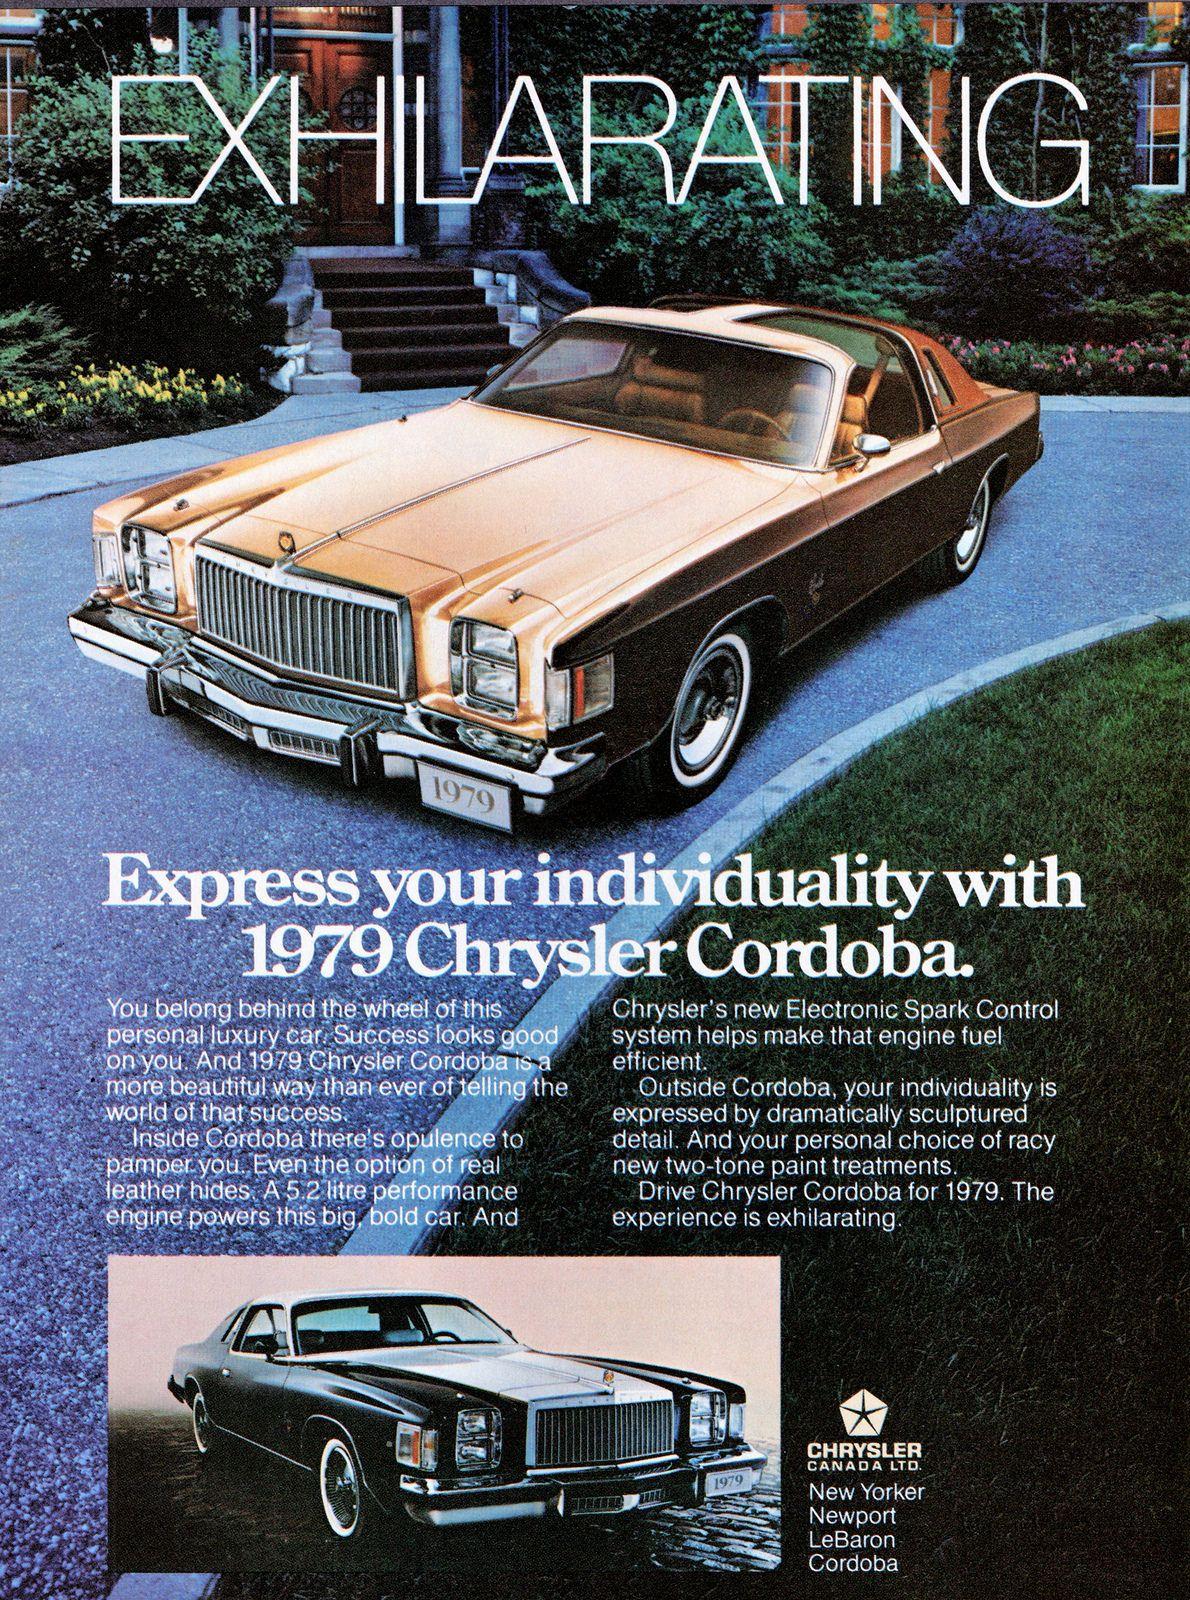 1976 CHRYSLER CORDOBA Car Vintage Look REPLICA METAL SIGN RICARDO MONTALBAN